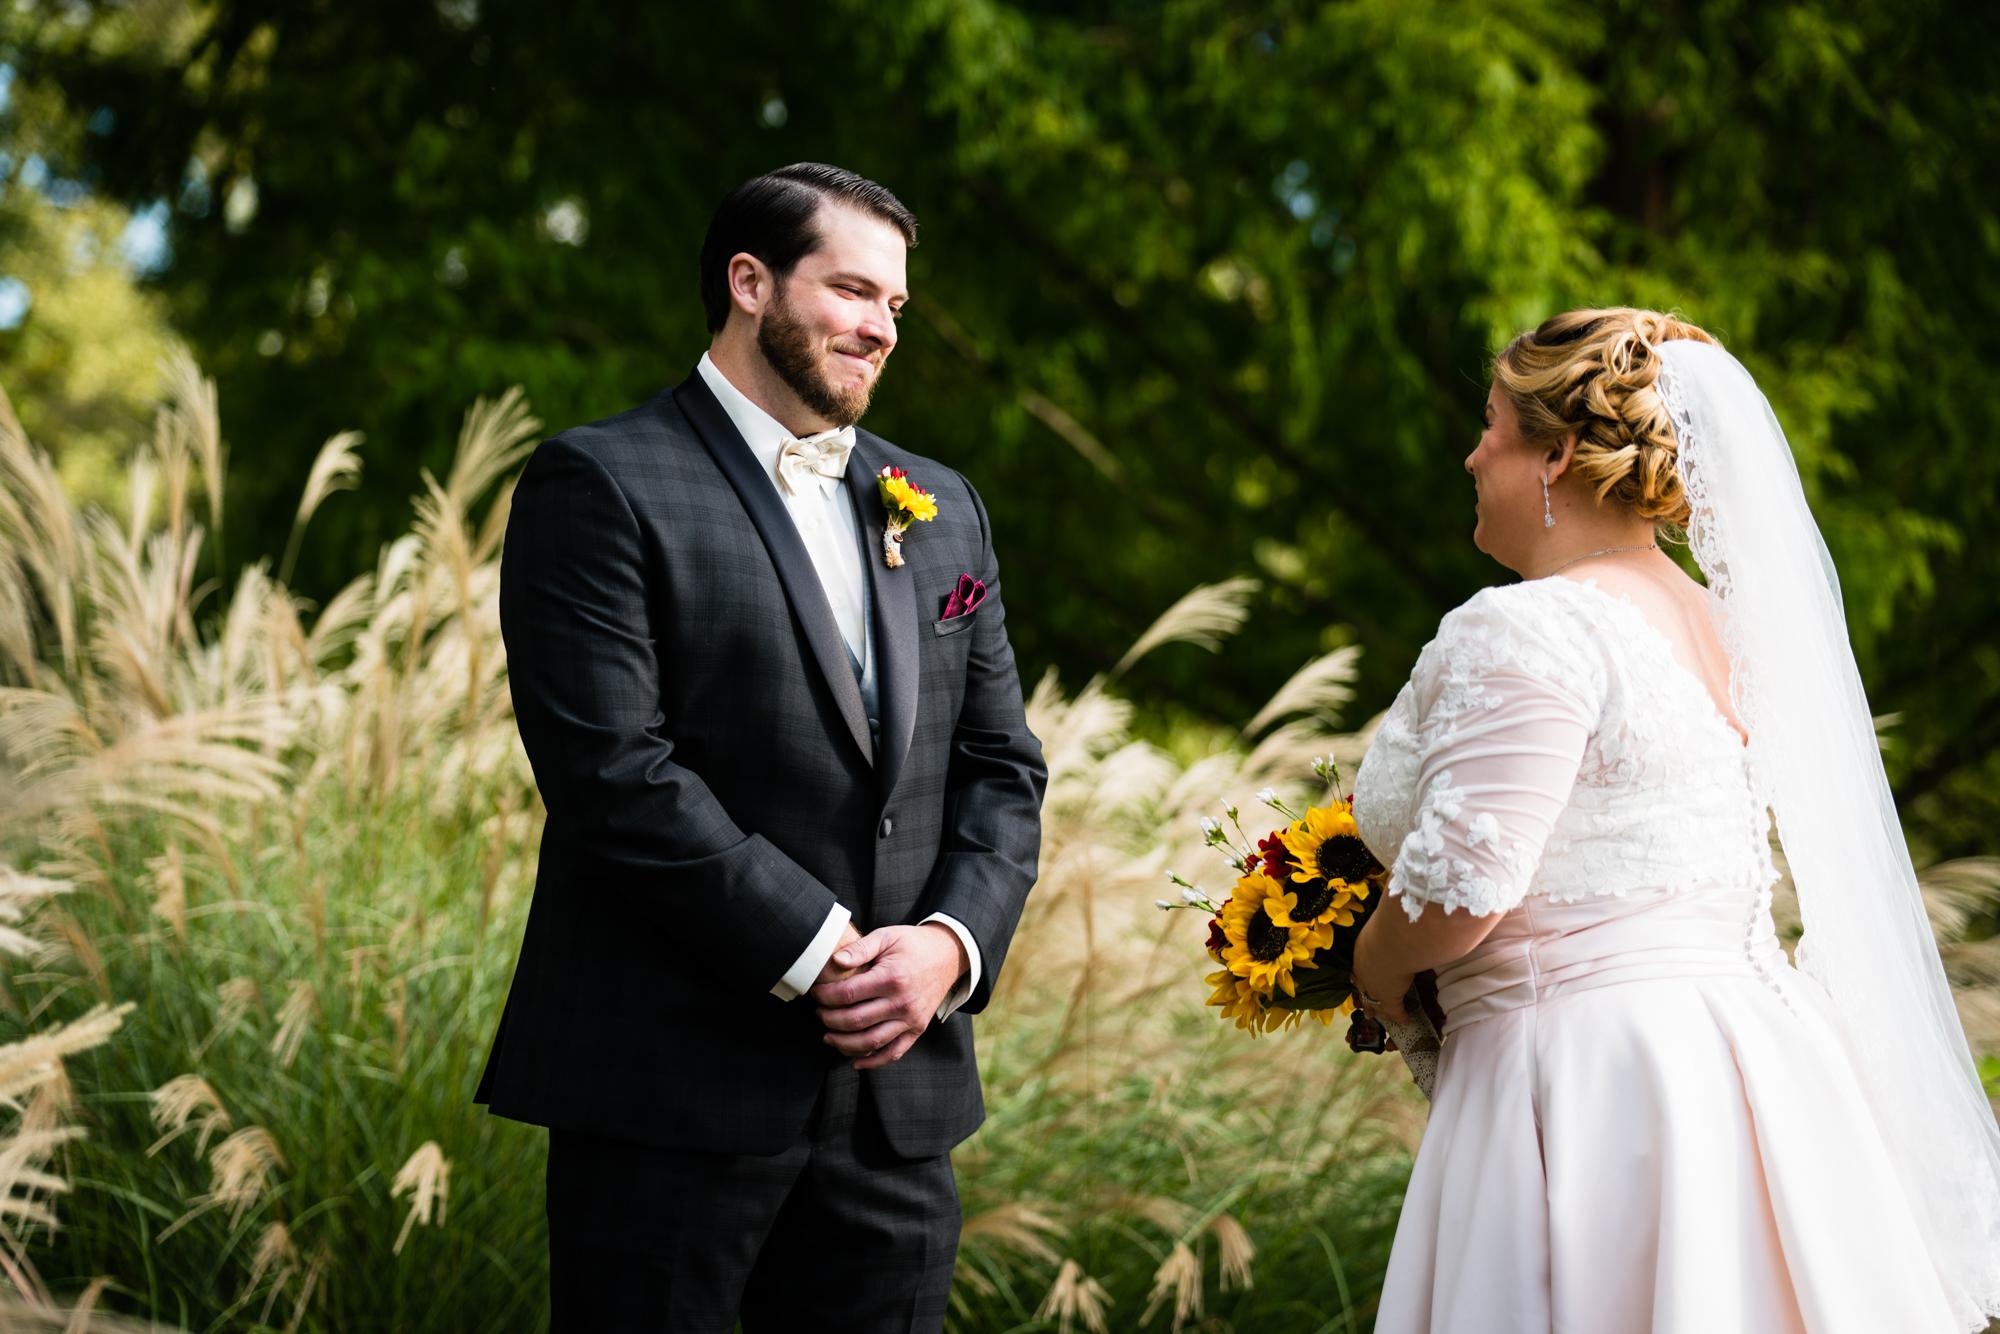 Cedar Brook Country Club Wedding Photography - Lovestruck Pictures-026.jpg